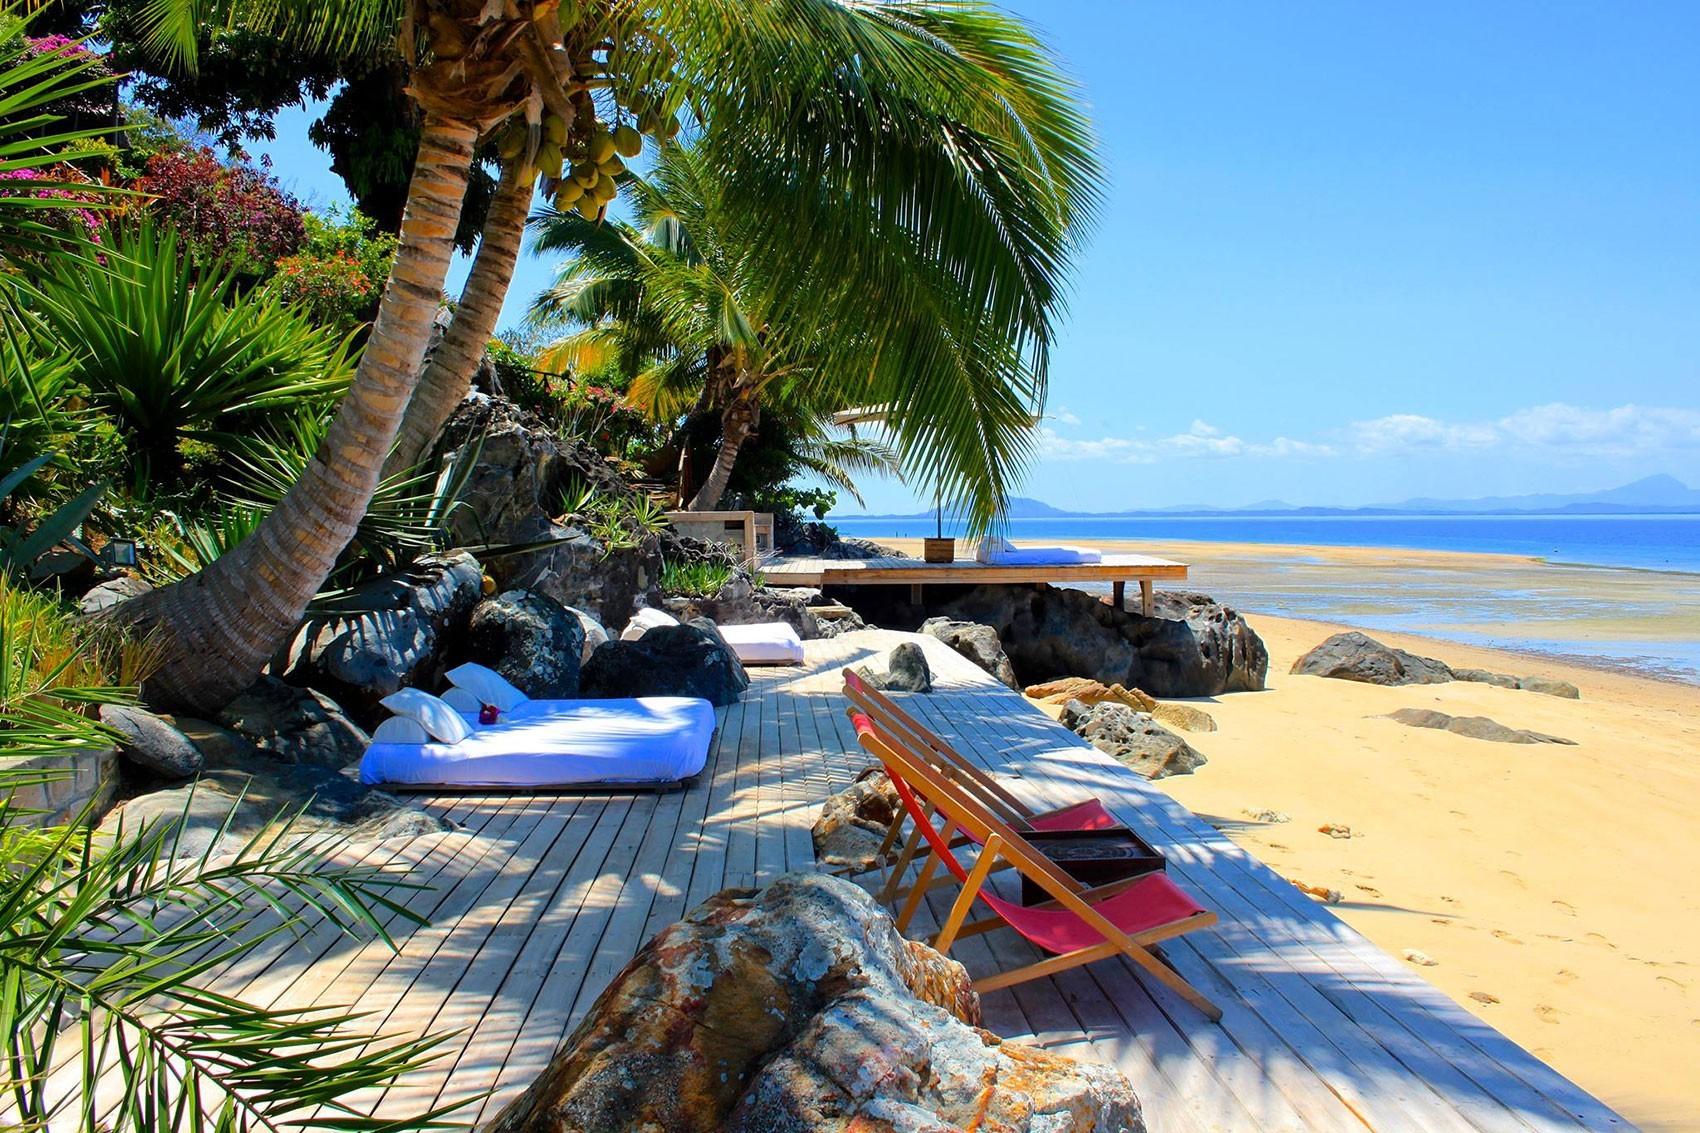 Ecolodge Hotel On Sun Island